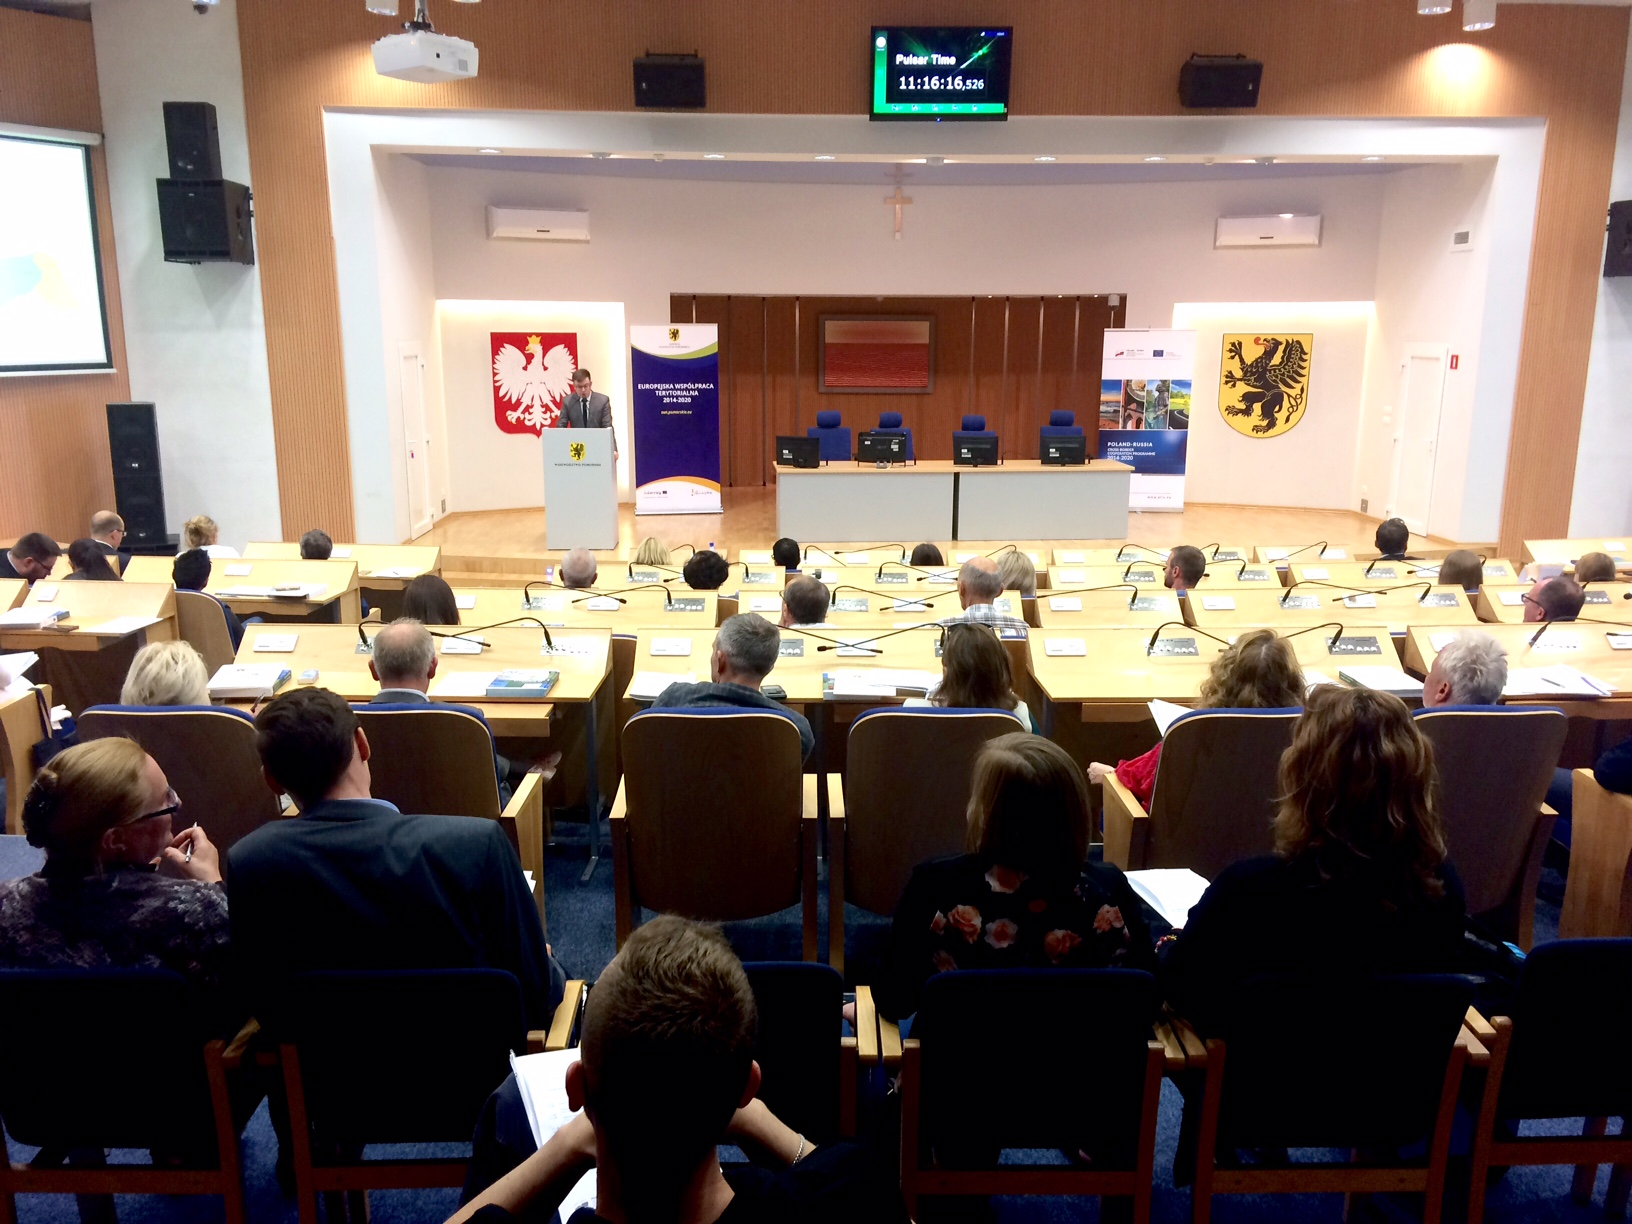 Spotkanie Polska-Rosja w Gdańsku – materiały do pobrania